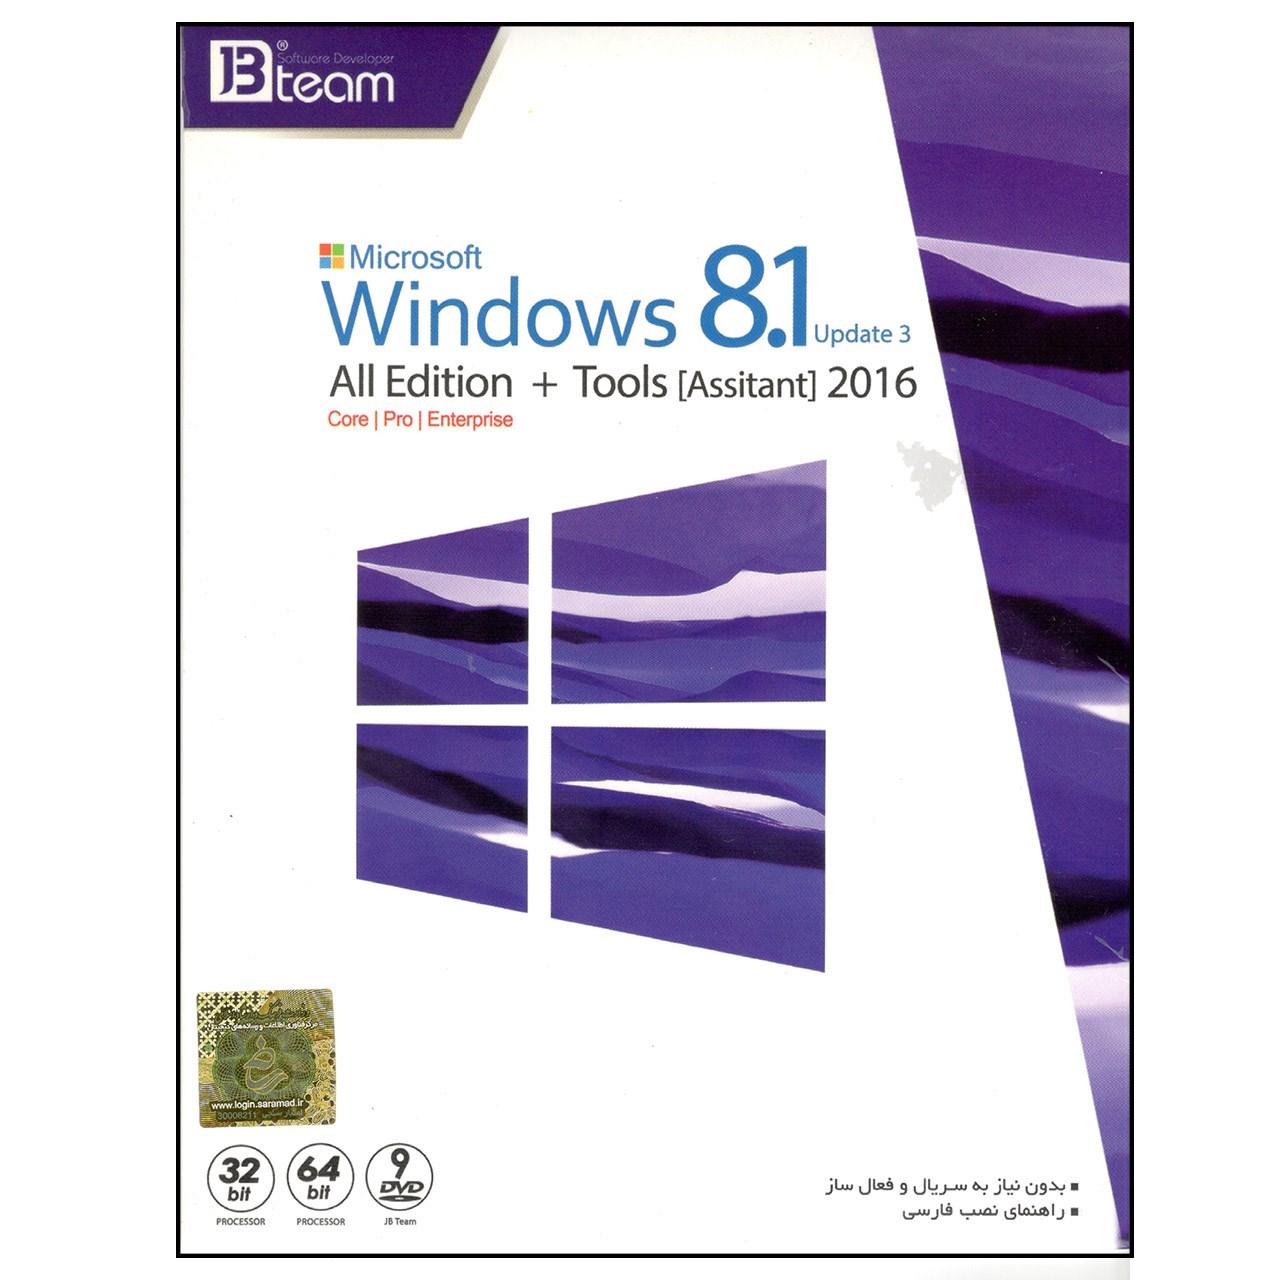 سیستم عامل ویندوز 8.1  نشر  جی بی تیم